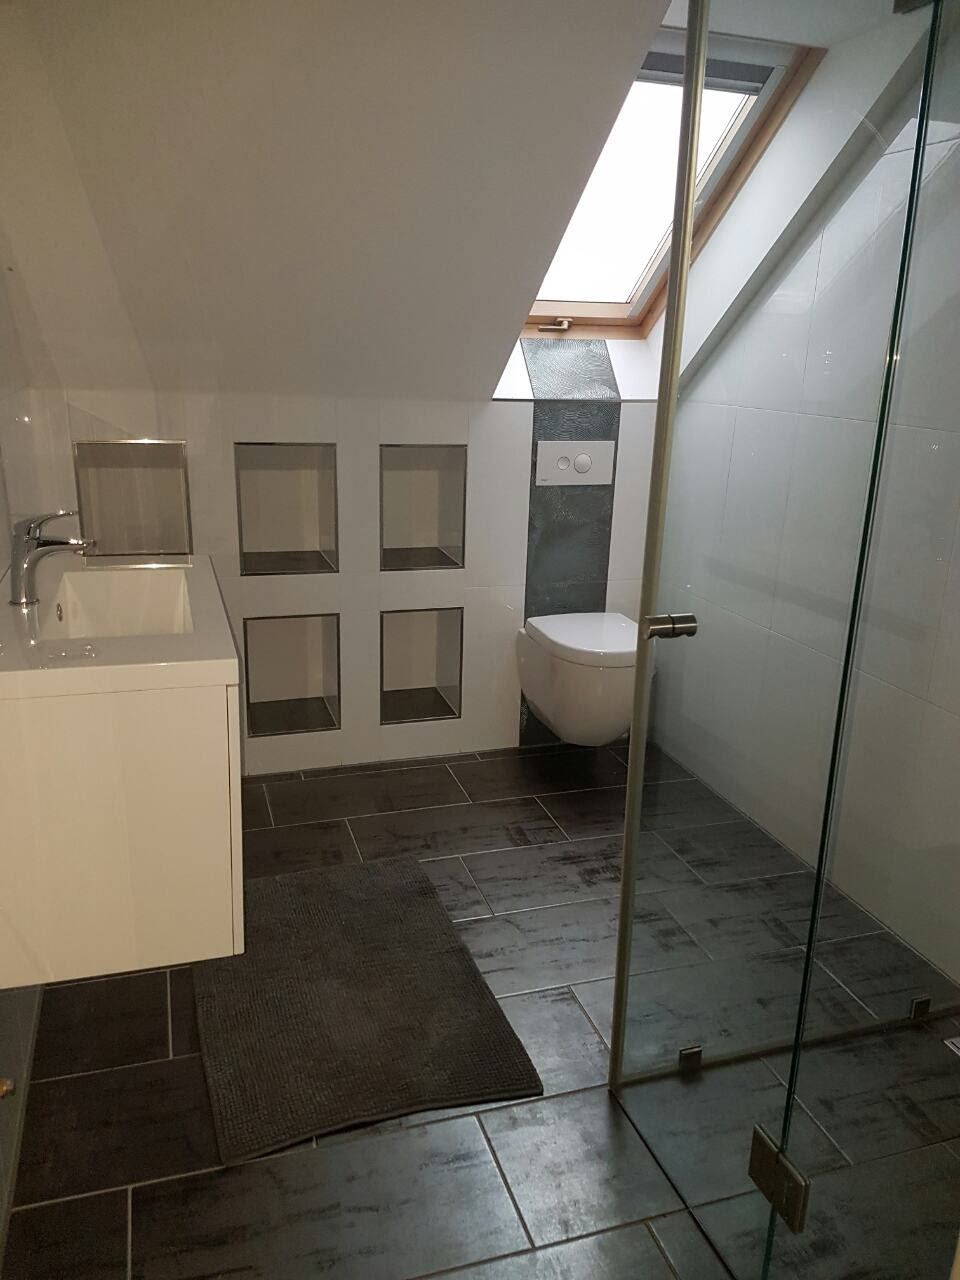 Berg huis interieur badkamer 2 – Pach Bouw BV